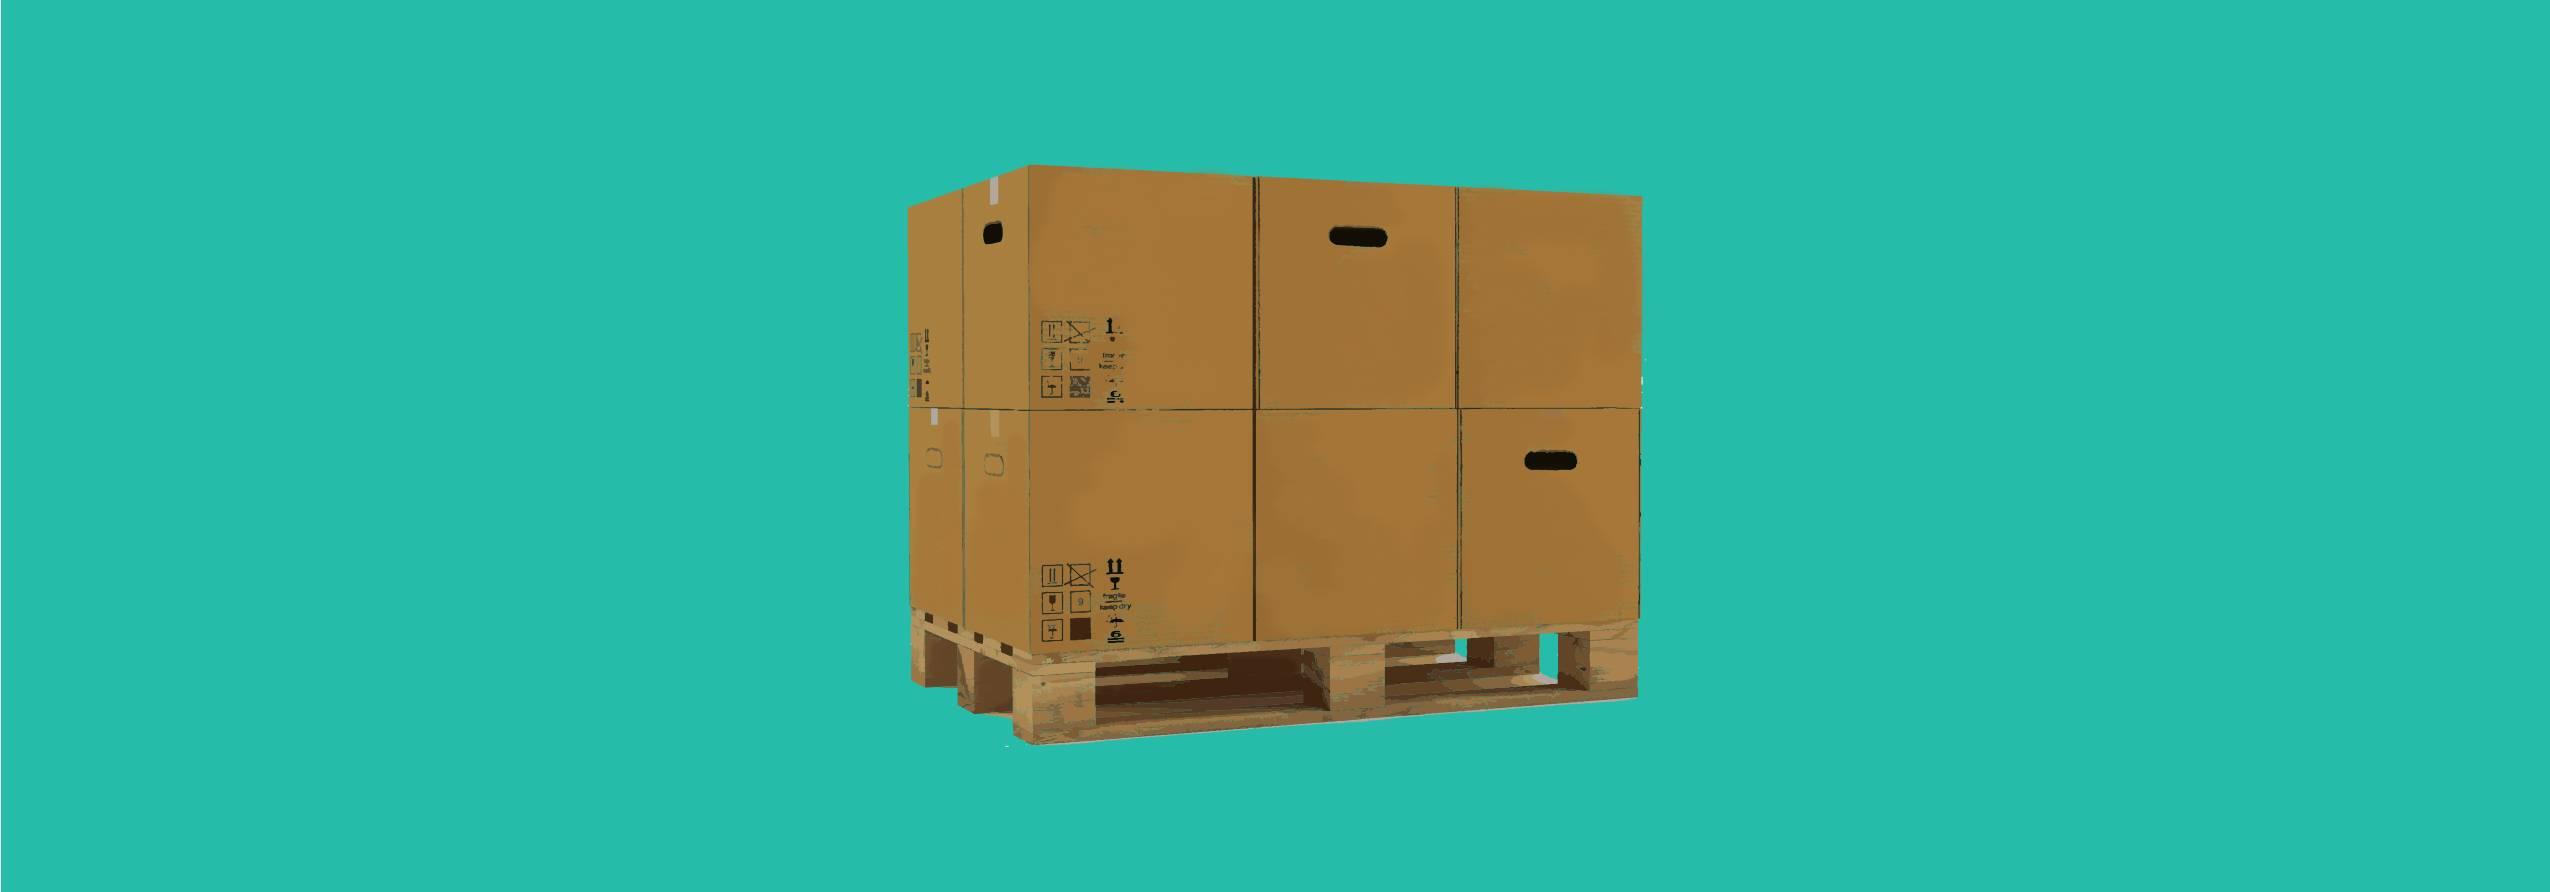 422 Storage packing supplies